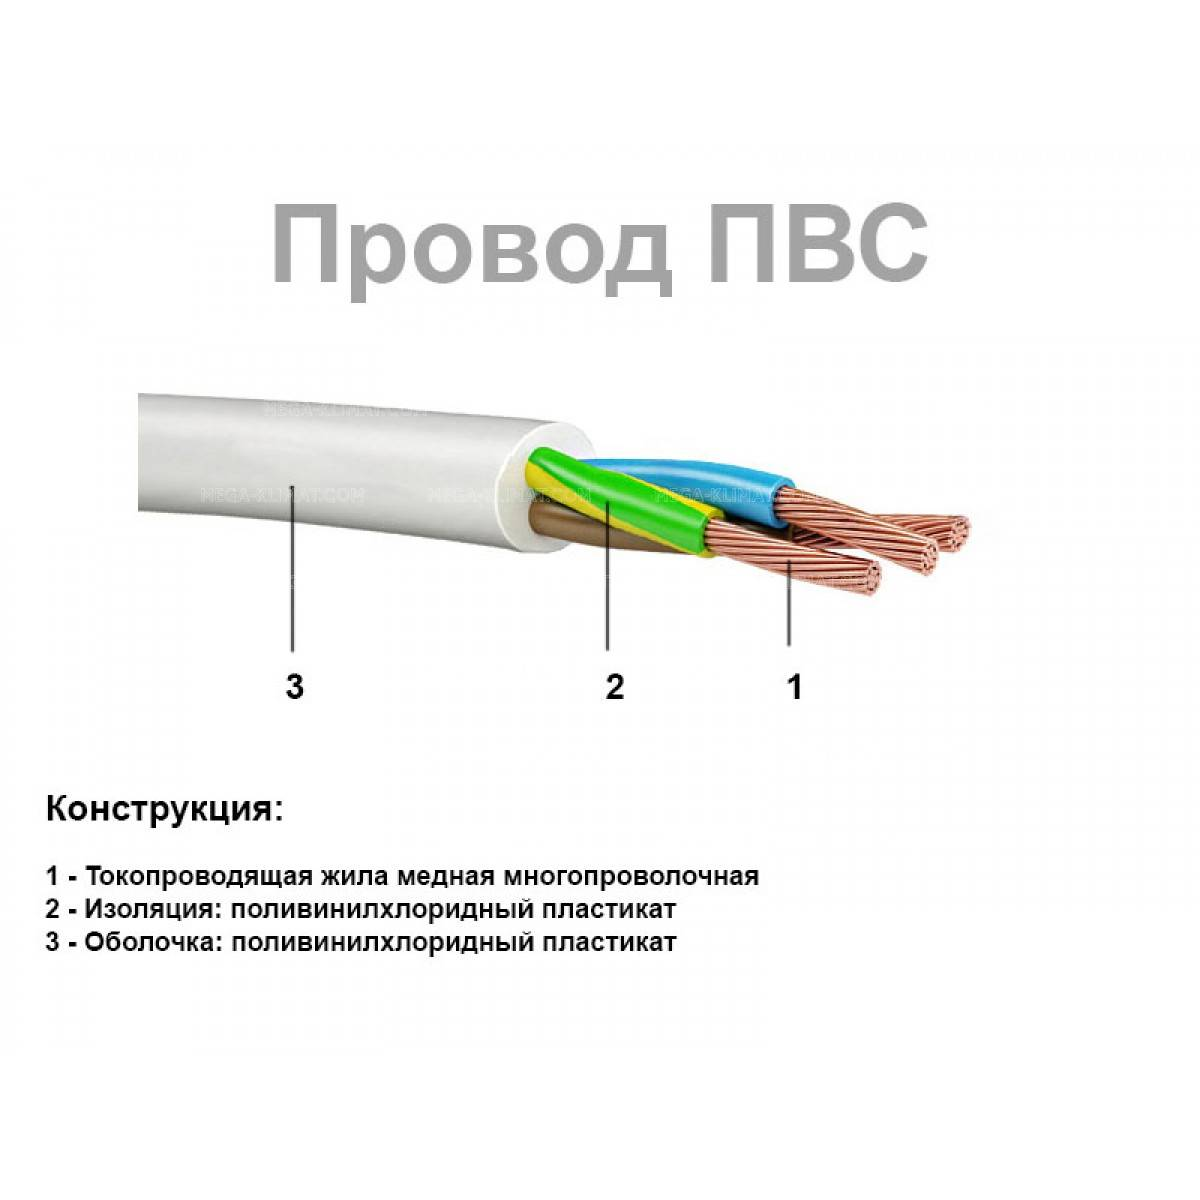 Описание и технические характеристики провода пвс